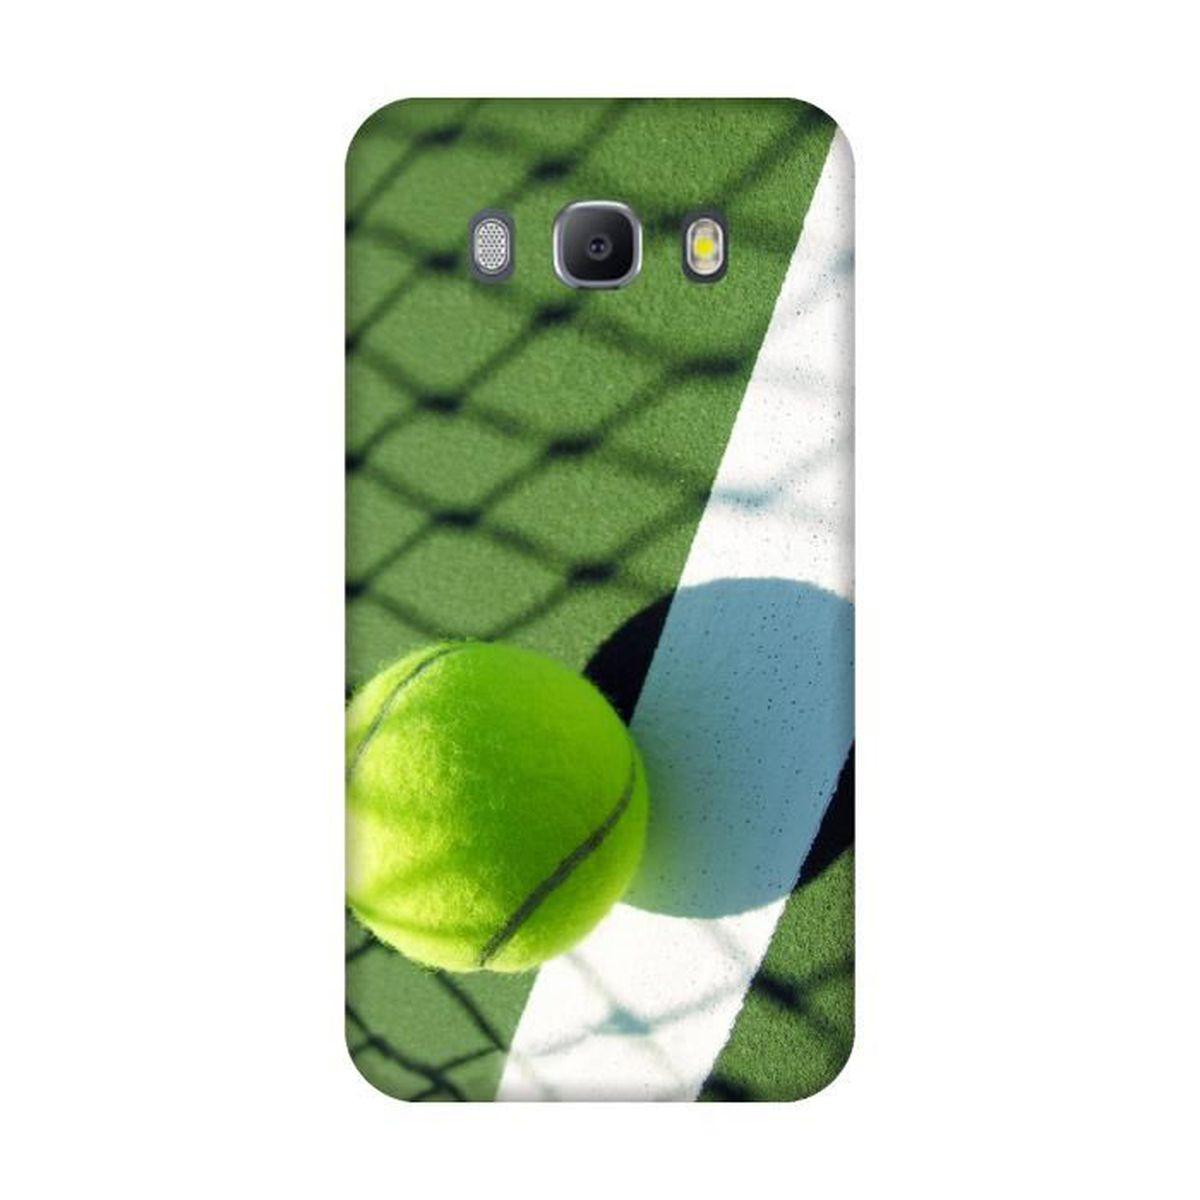 782fec440a412 COQUE - BUMPER Coque Galaxy J1 Mini Prime - Balle de tennis